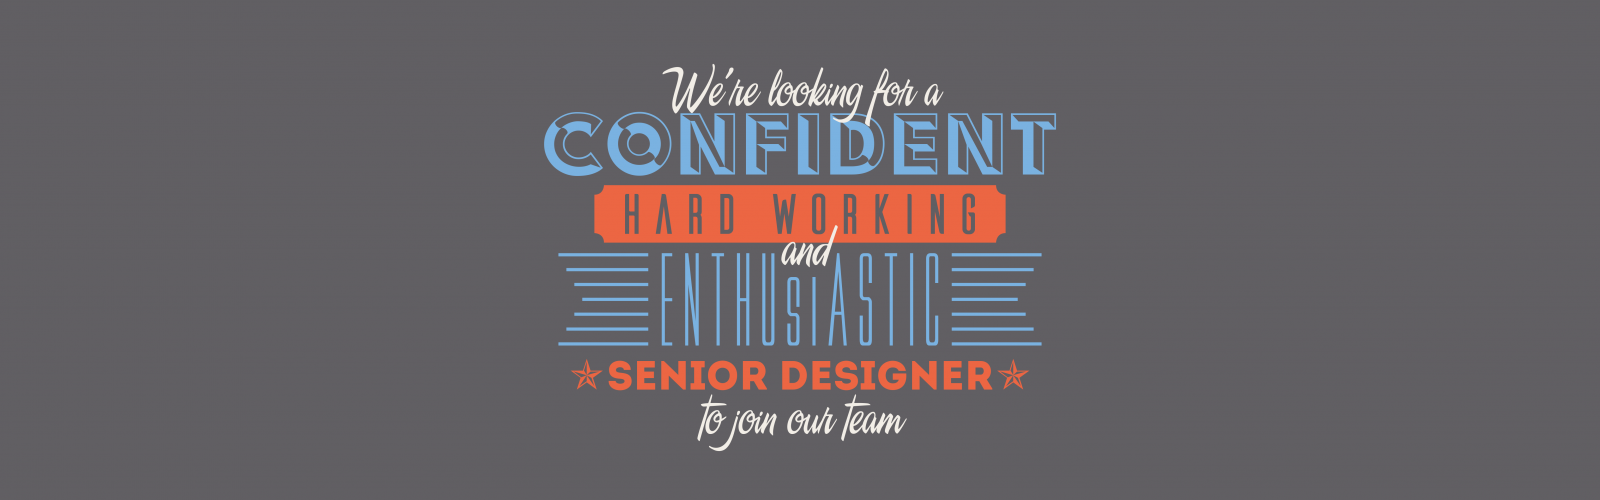 Senior Design Job Cover 1600 X 600px HR